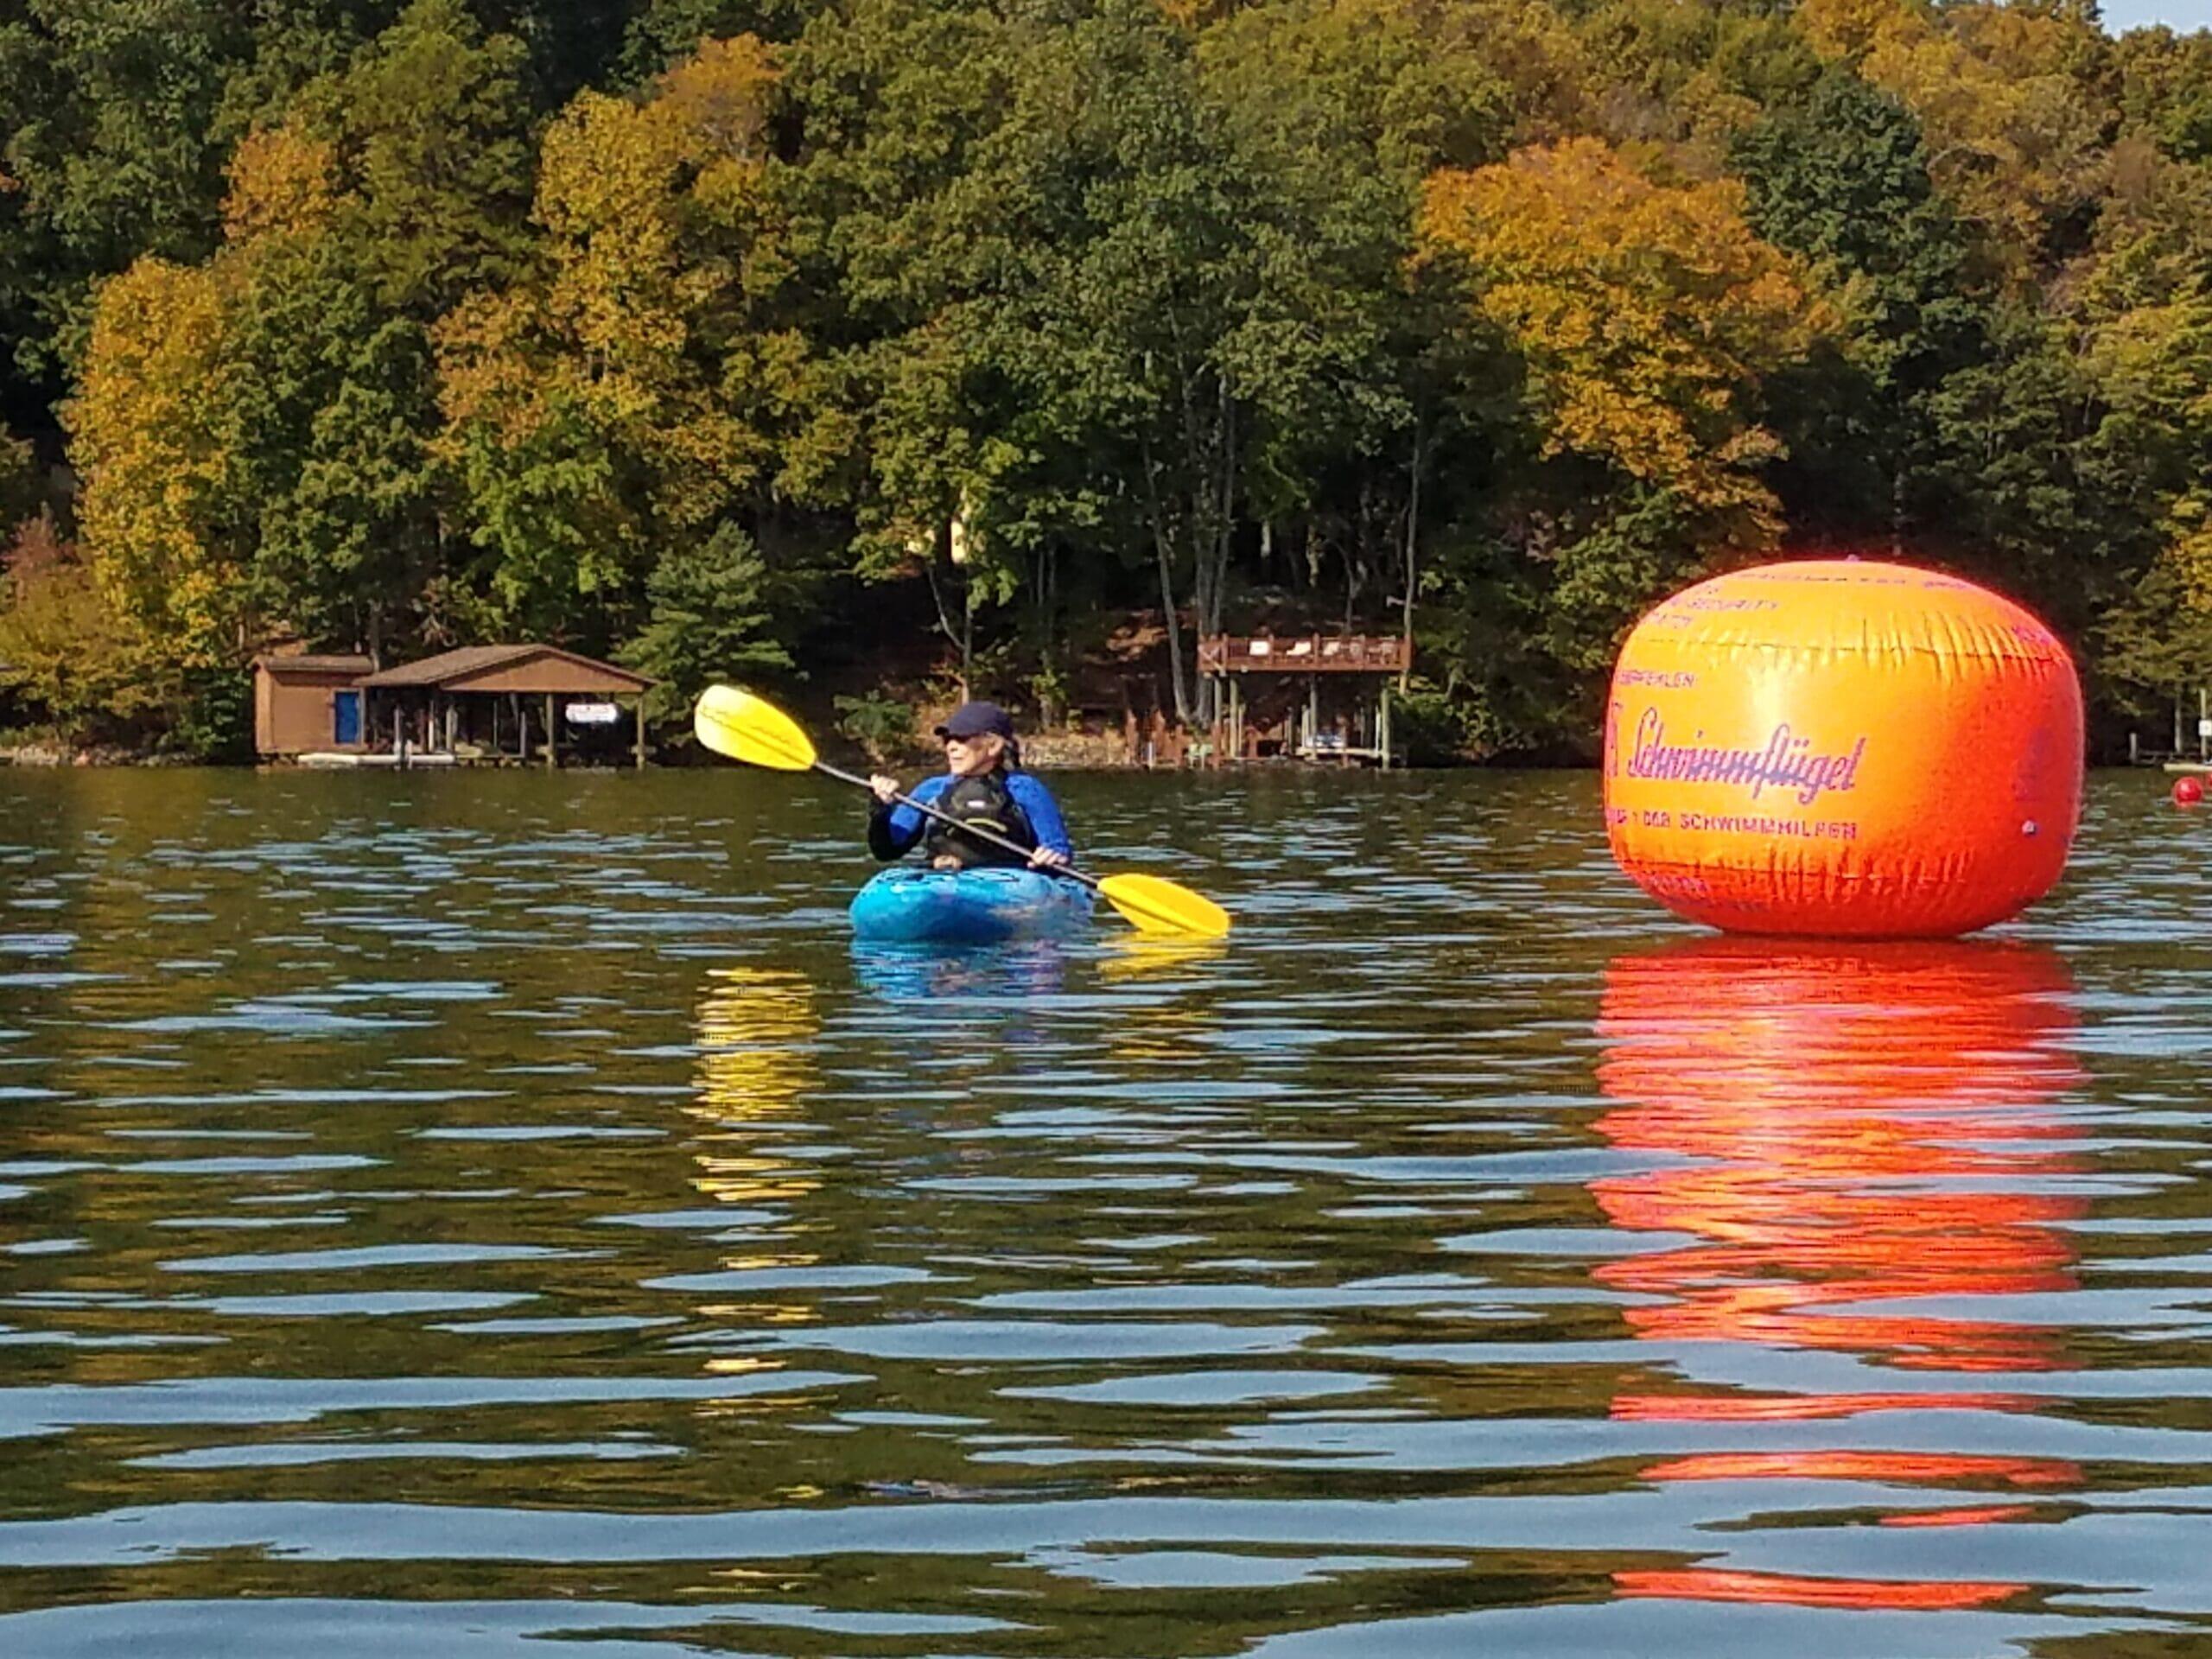 Kayak guy and orange float